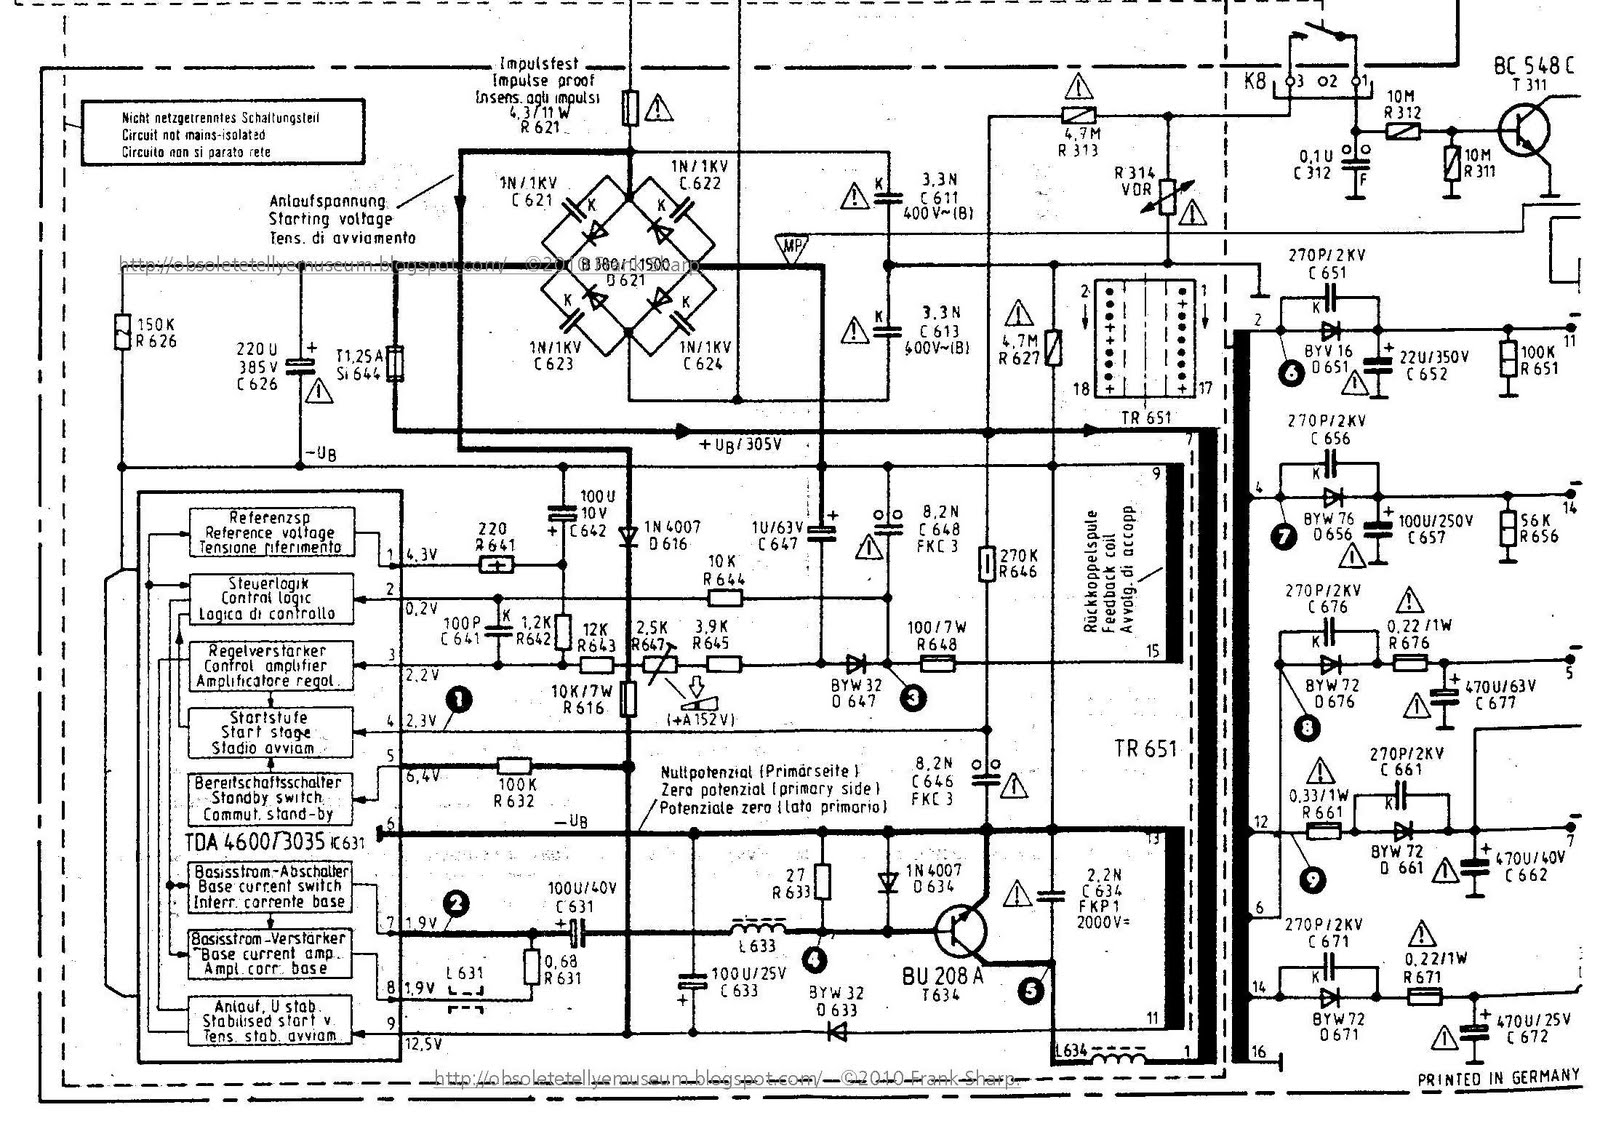 medium resolution of ifb washing machine motor wiring diagram wiring library rh 4 evitta de whirlpool washing machine model numbers whirlpool washing machine wiring diagram